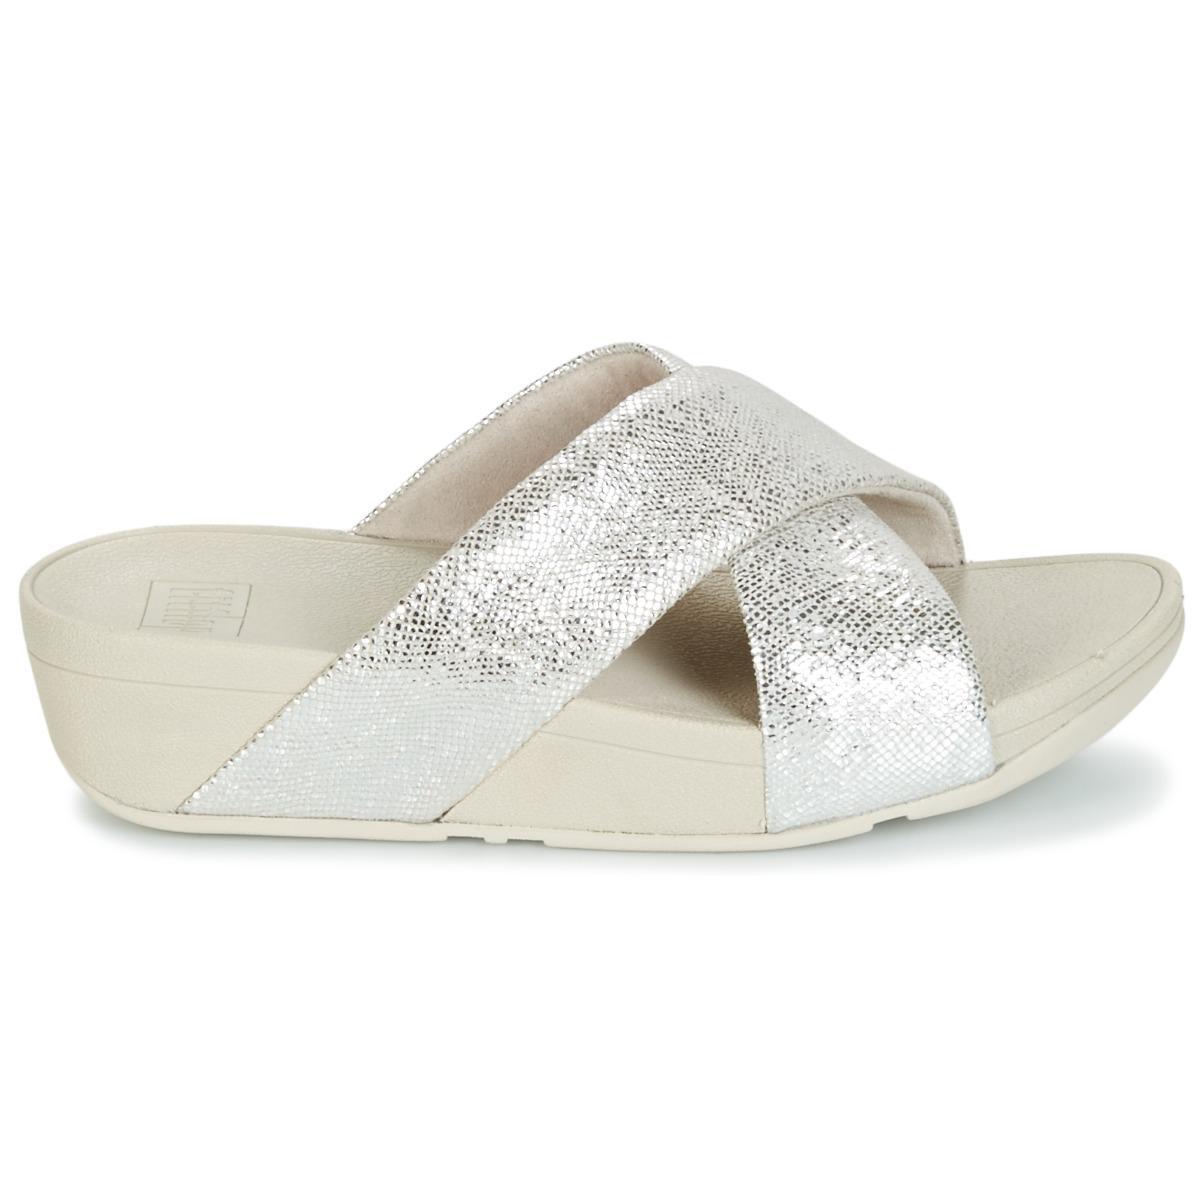 6172d11c9f13 Fitflop - Metallic Swoop Slide Women s Mules   Casual Shoes In Silver -  Lyst. View fullscreen